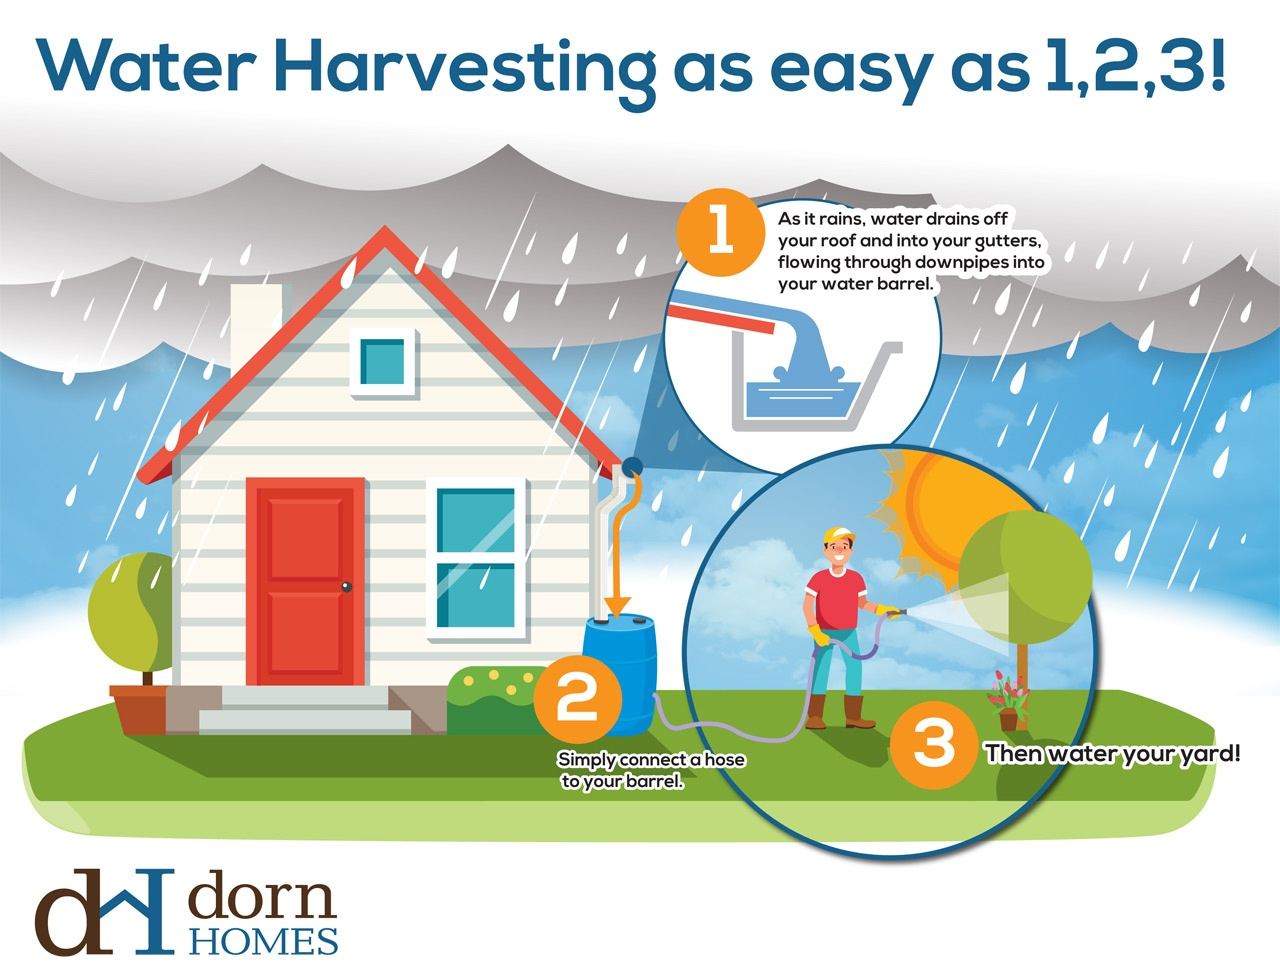 Introducing Rain Water Harvesting at Saddlewood